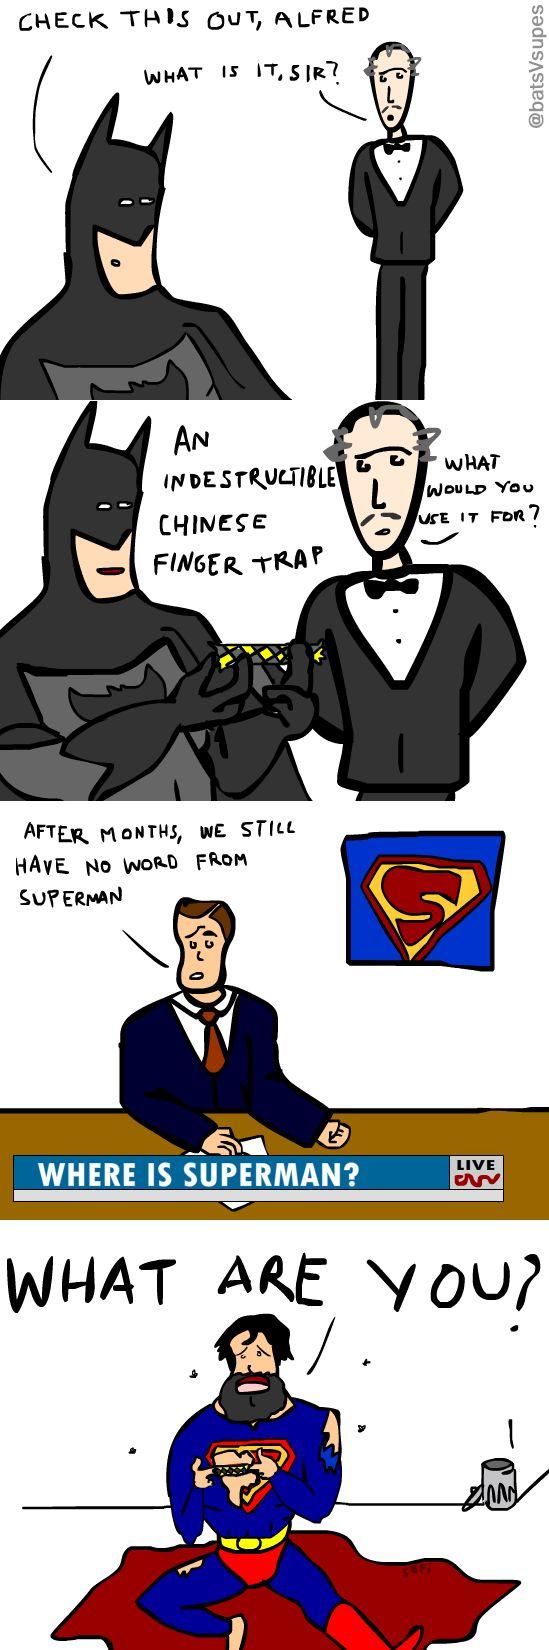 Bats vs Supes - Imgur